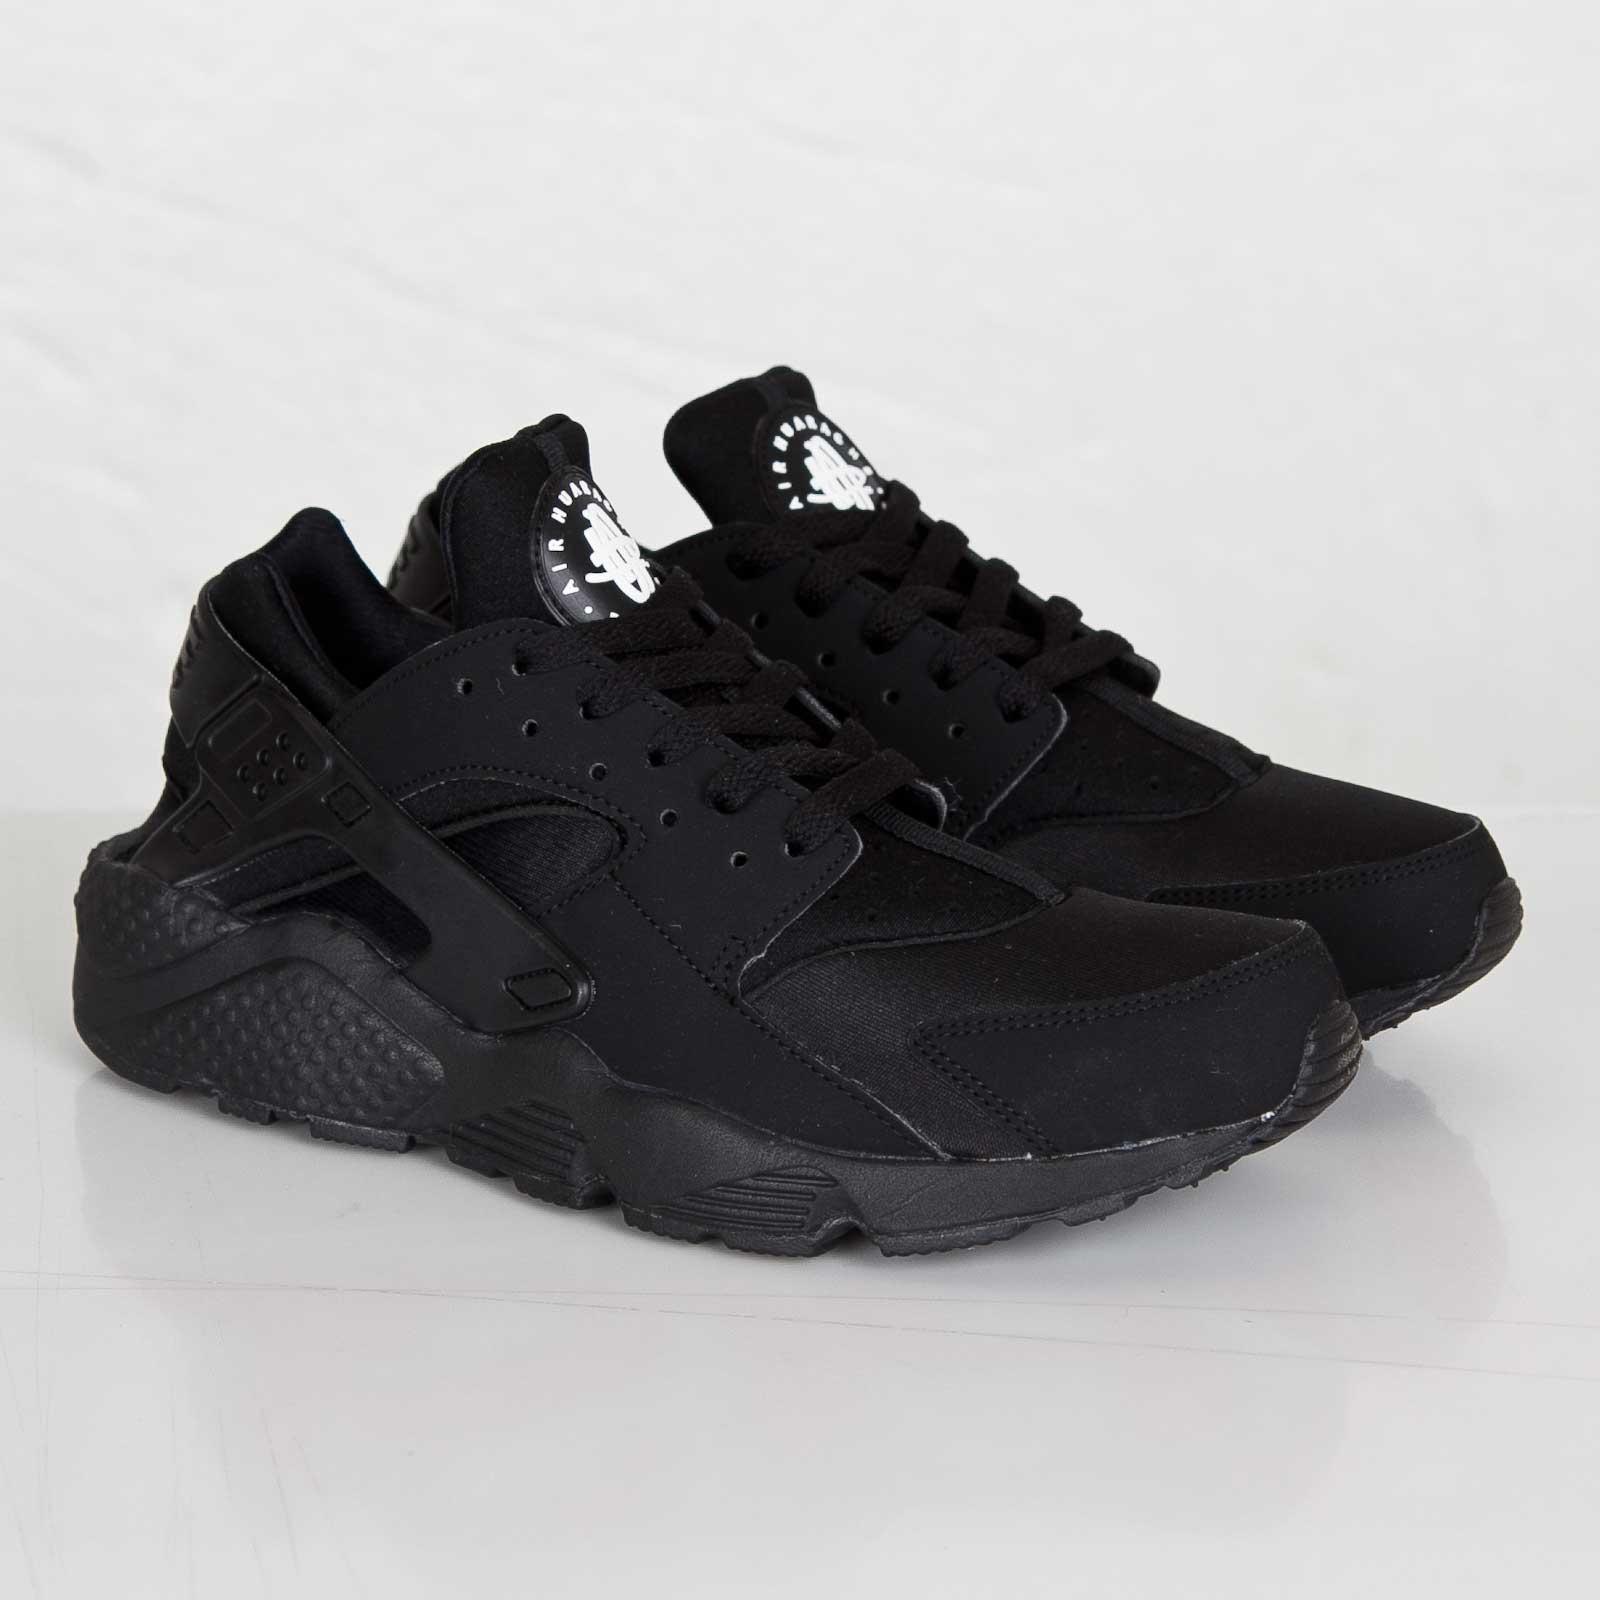 130077b24bbb Nike Air Huarache - 318429-003 - Sneakersnstuff